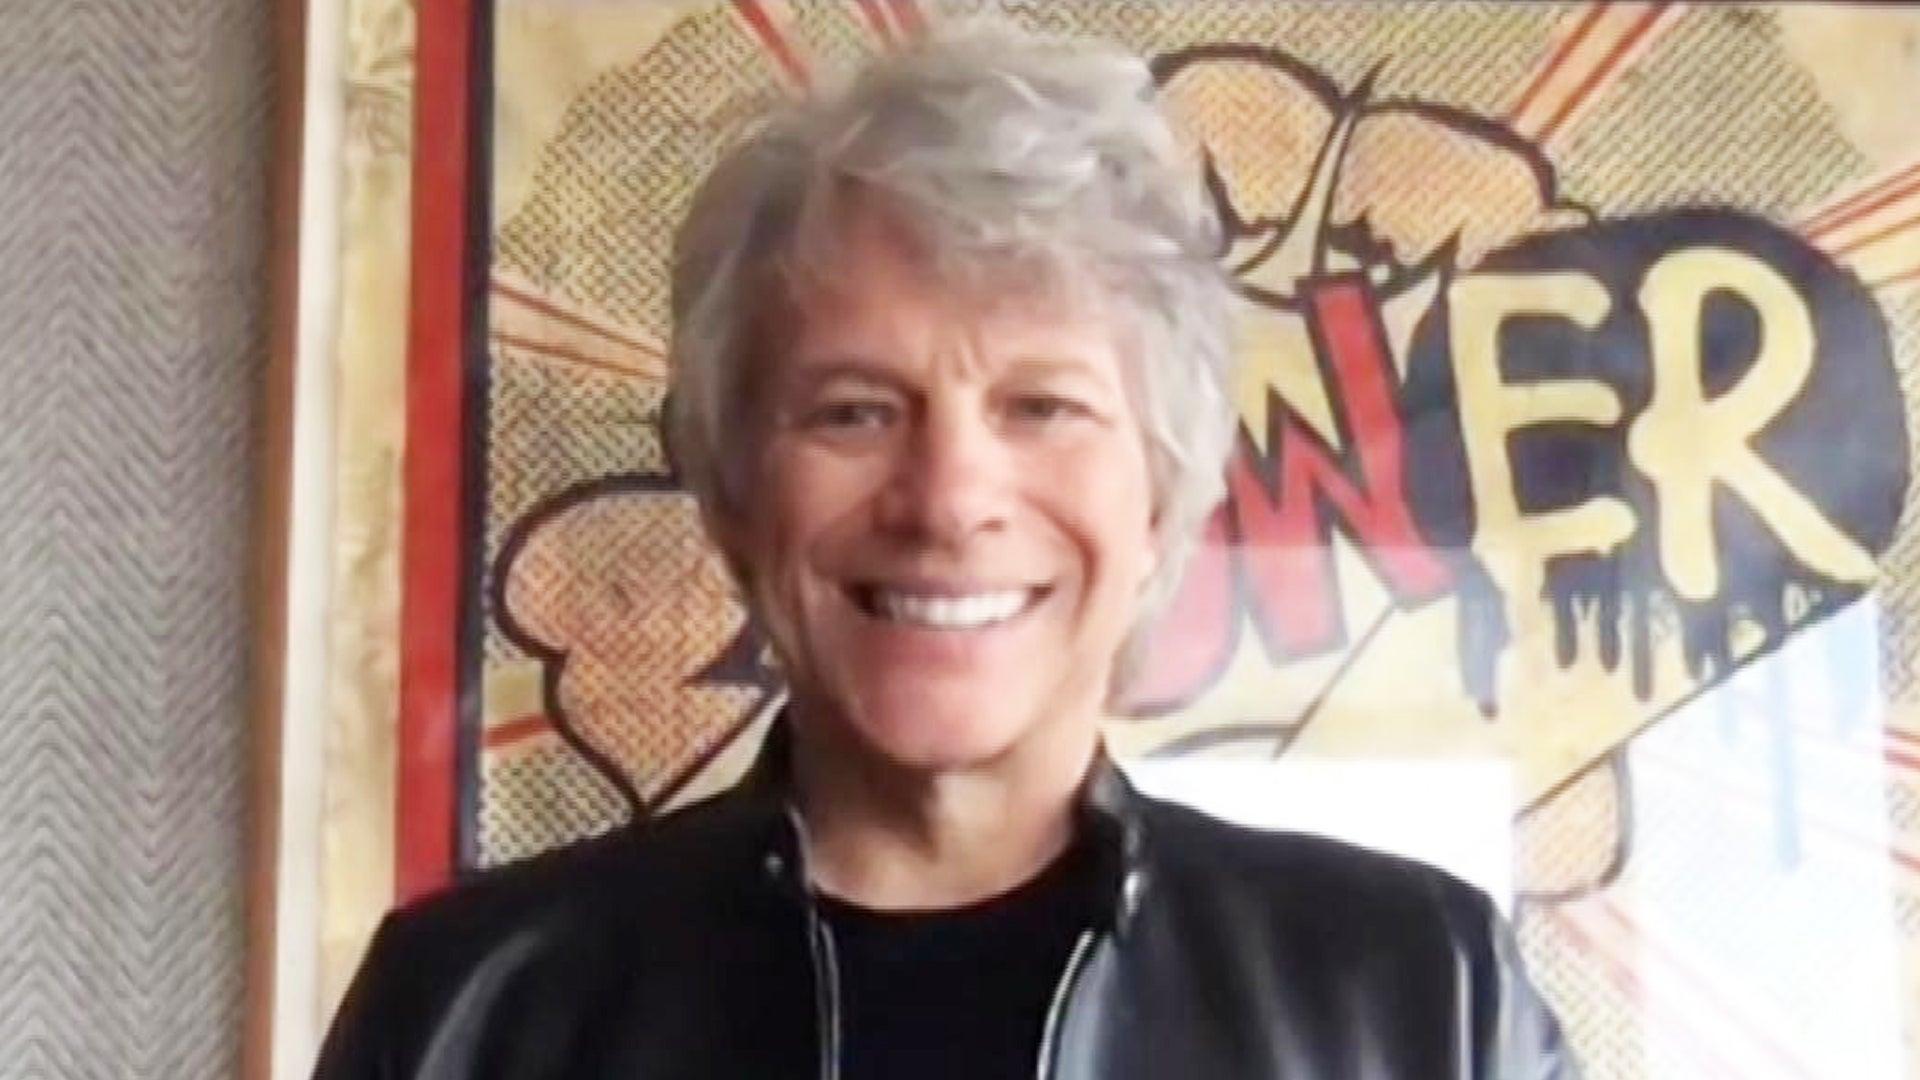 Jon Bon Jovi On His Musical Milestones And Inspiring Hope With New Music Exclusive Entertainment Tonight